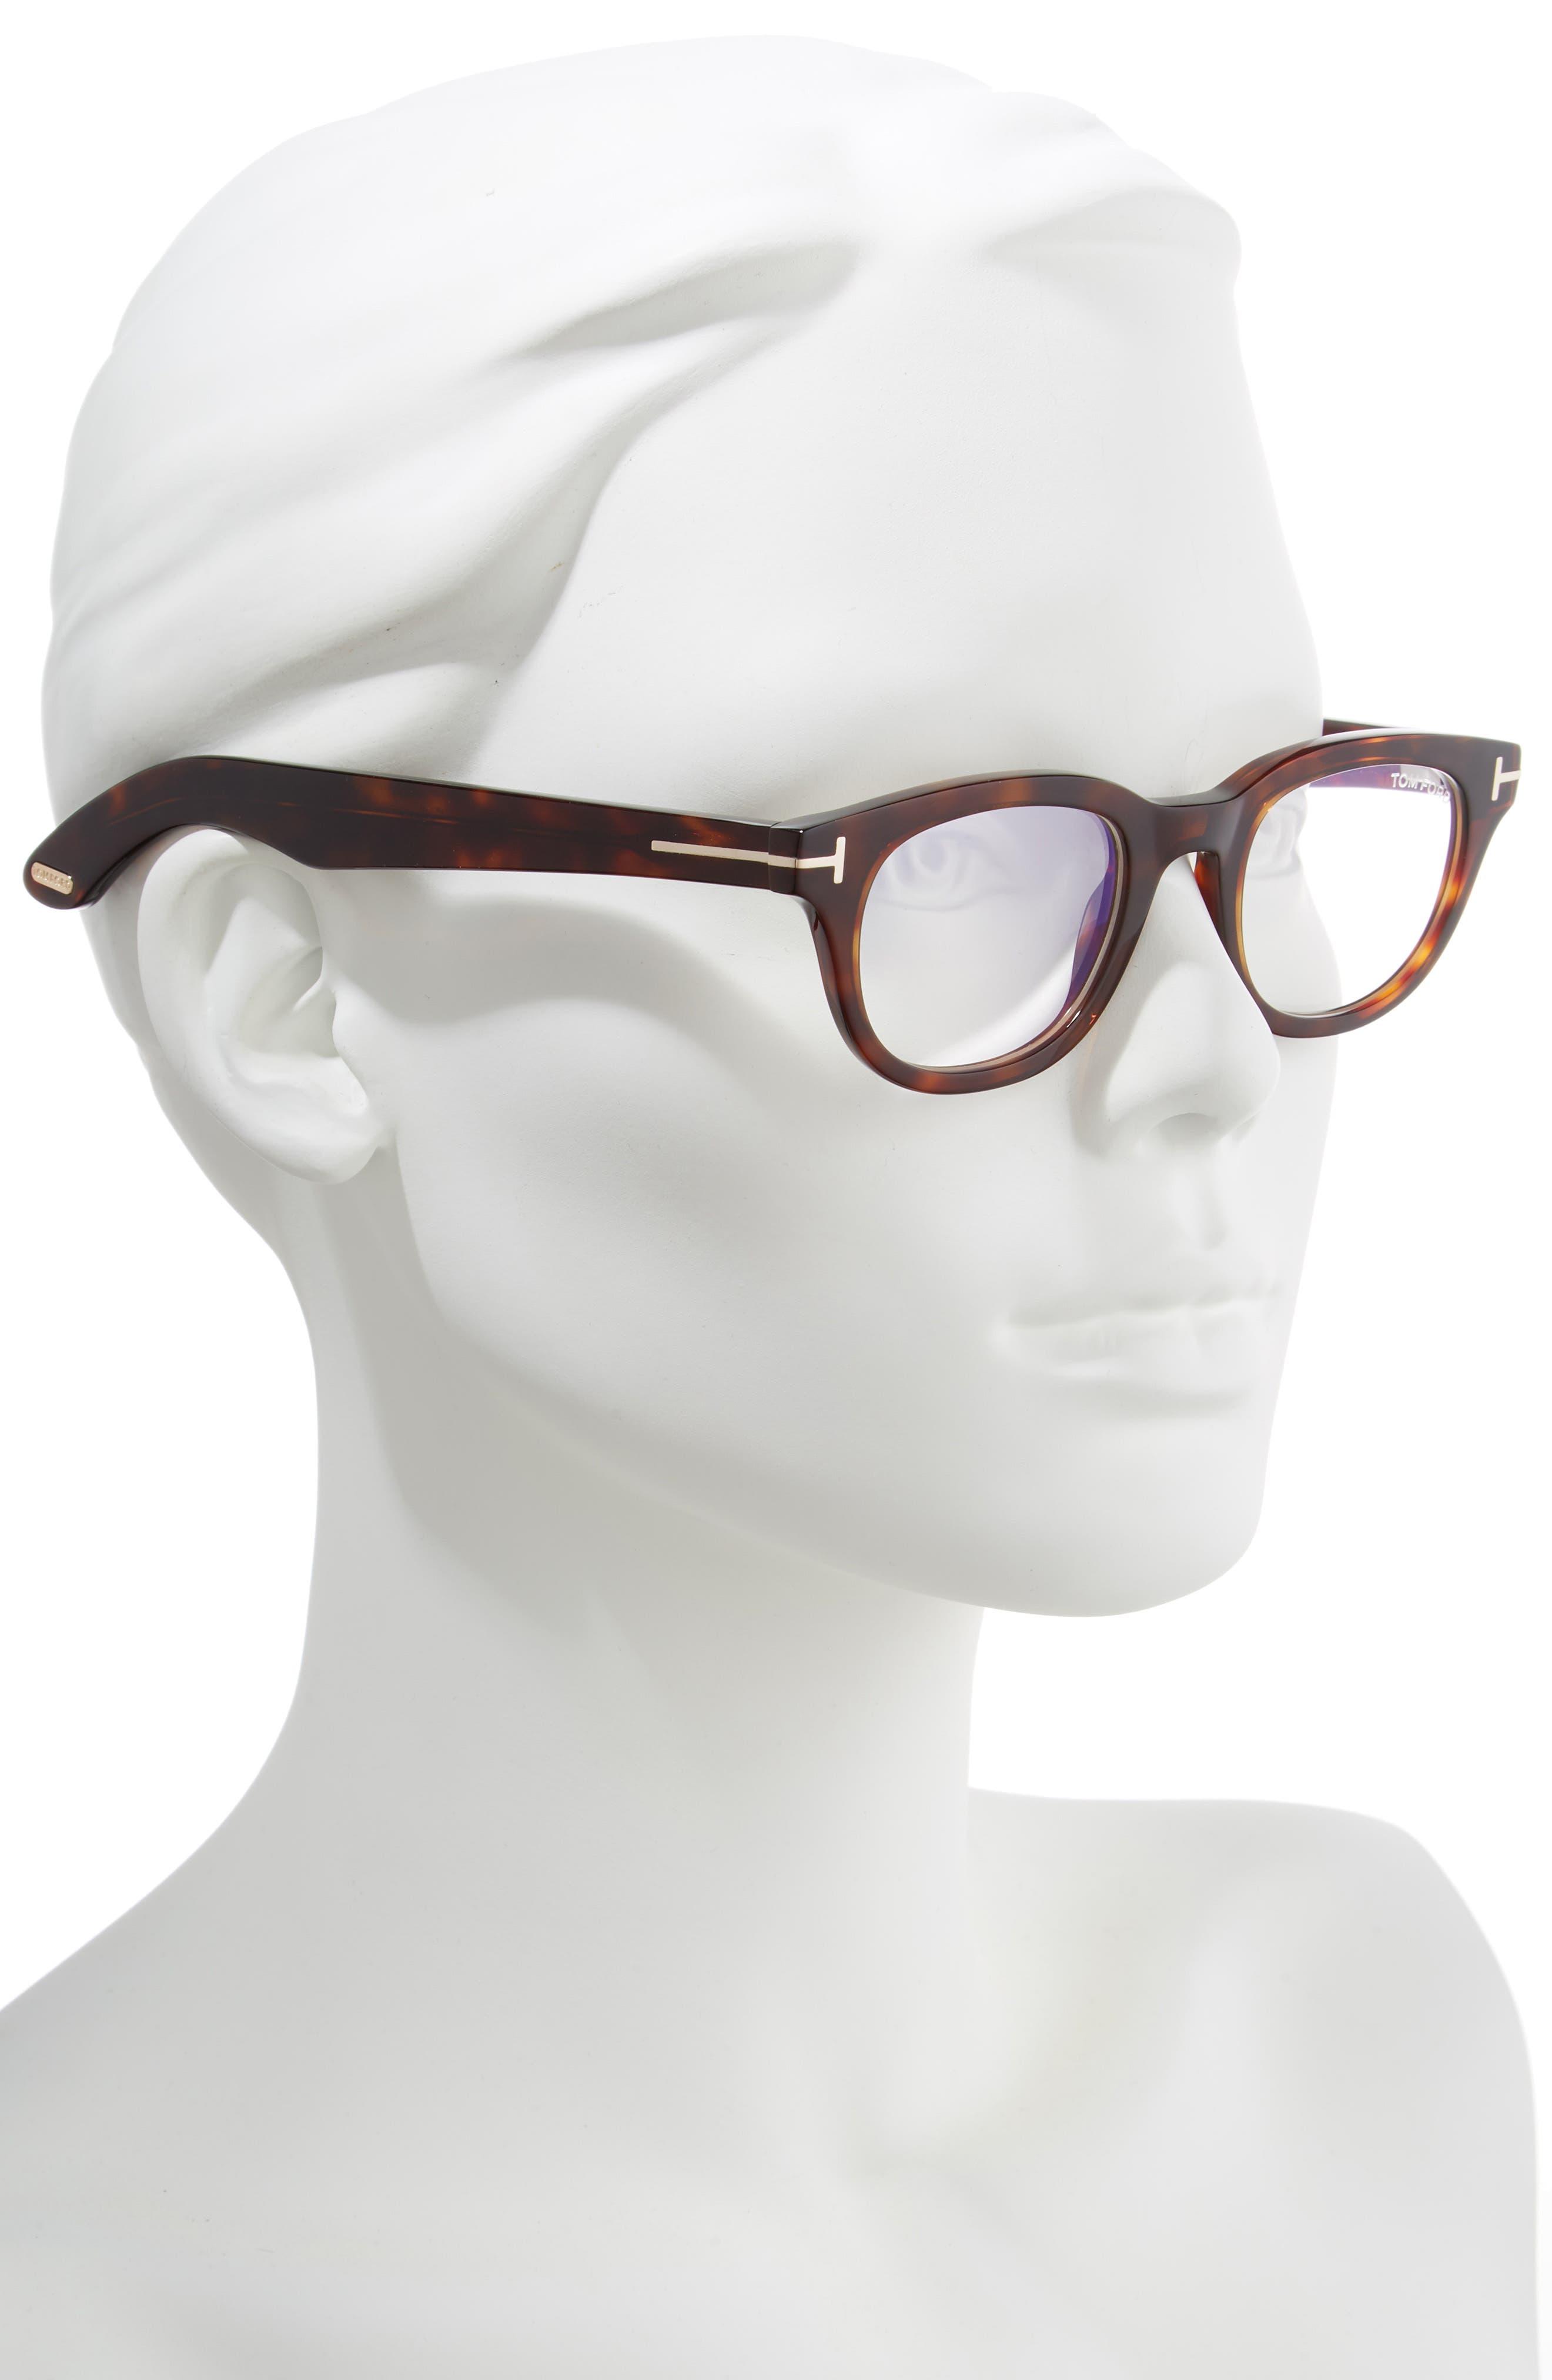 46mm Blue Light Blocking Glasses,                             Alternate thumbnail 2, color,                             SHINY DARK HAVANA/ ROSE GOLD